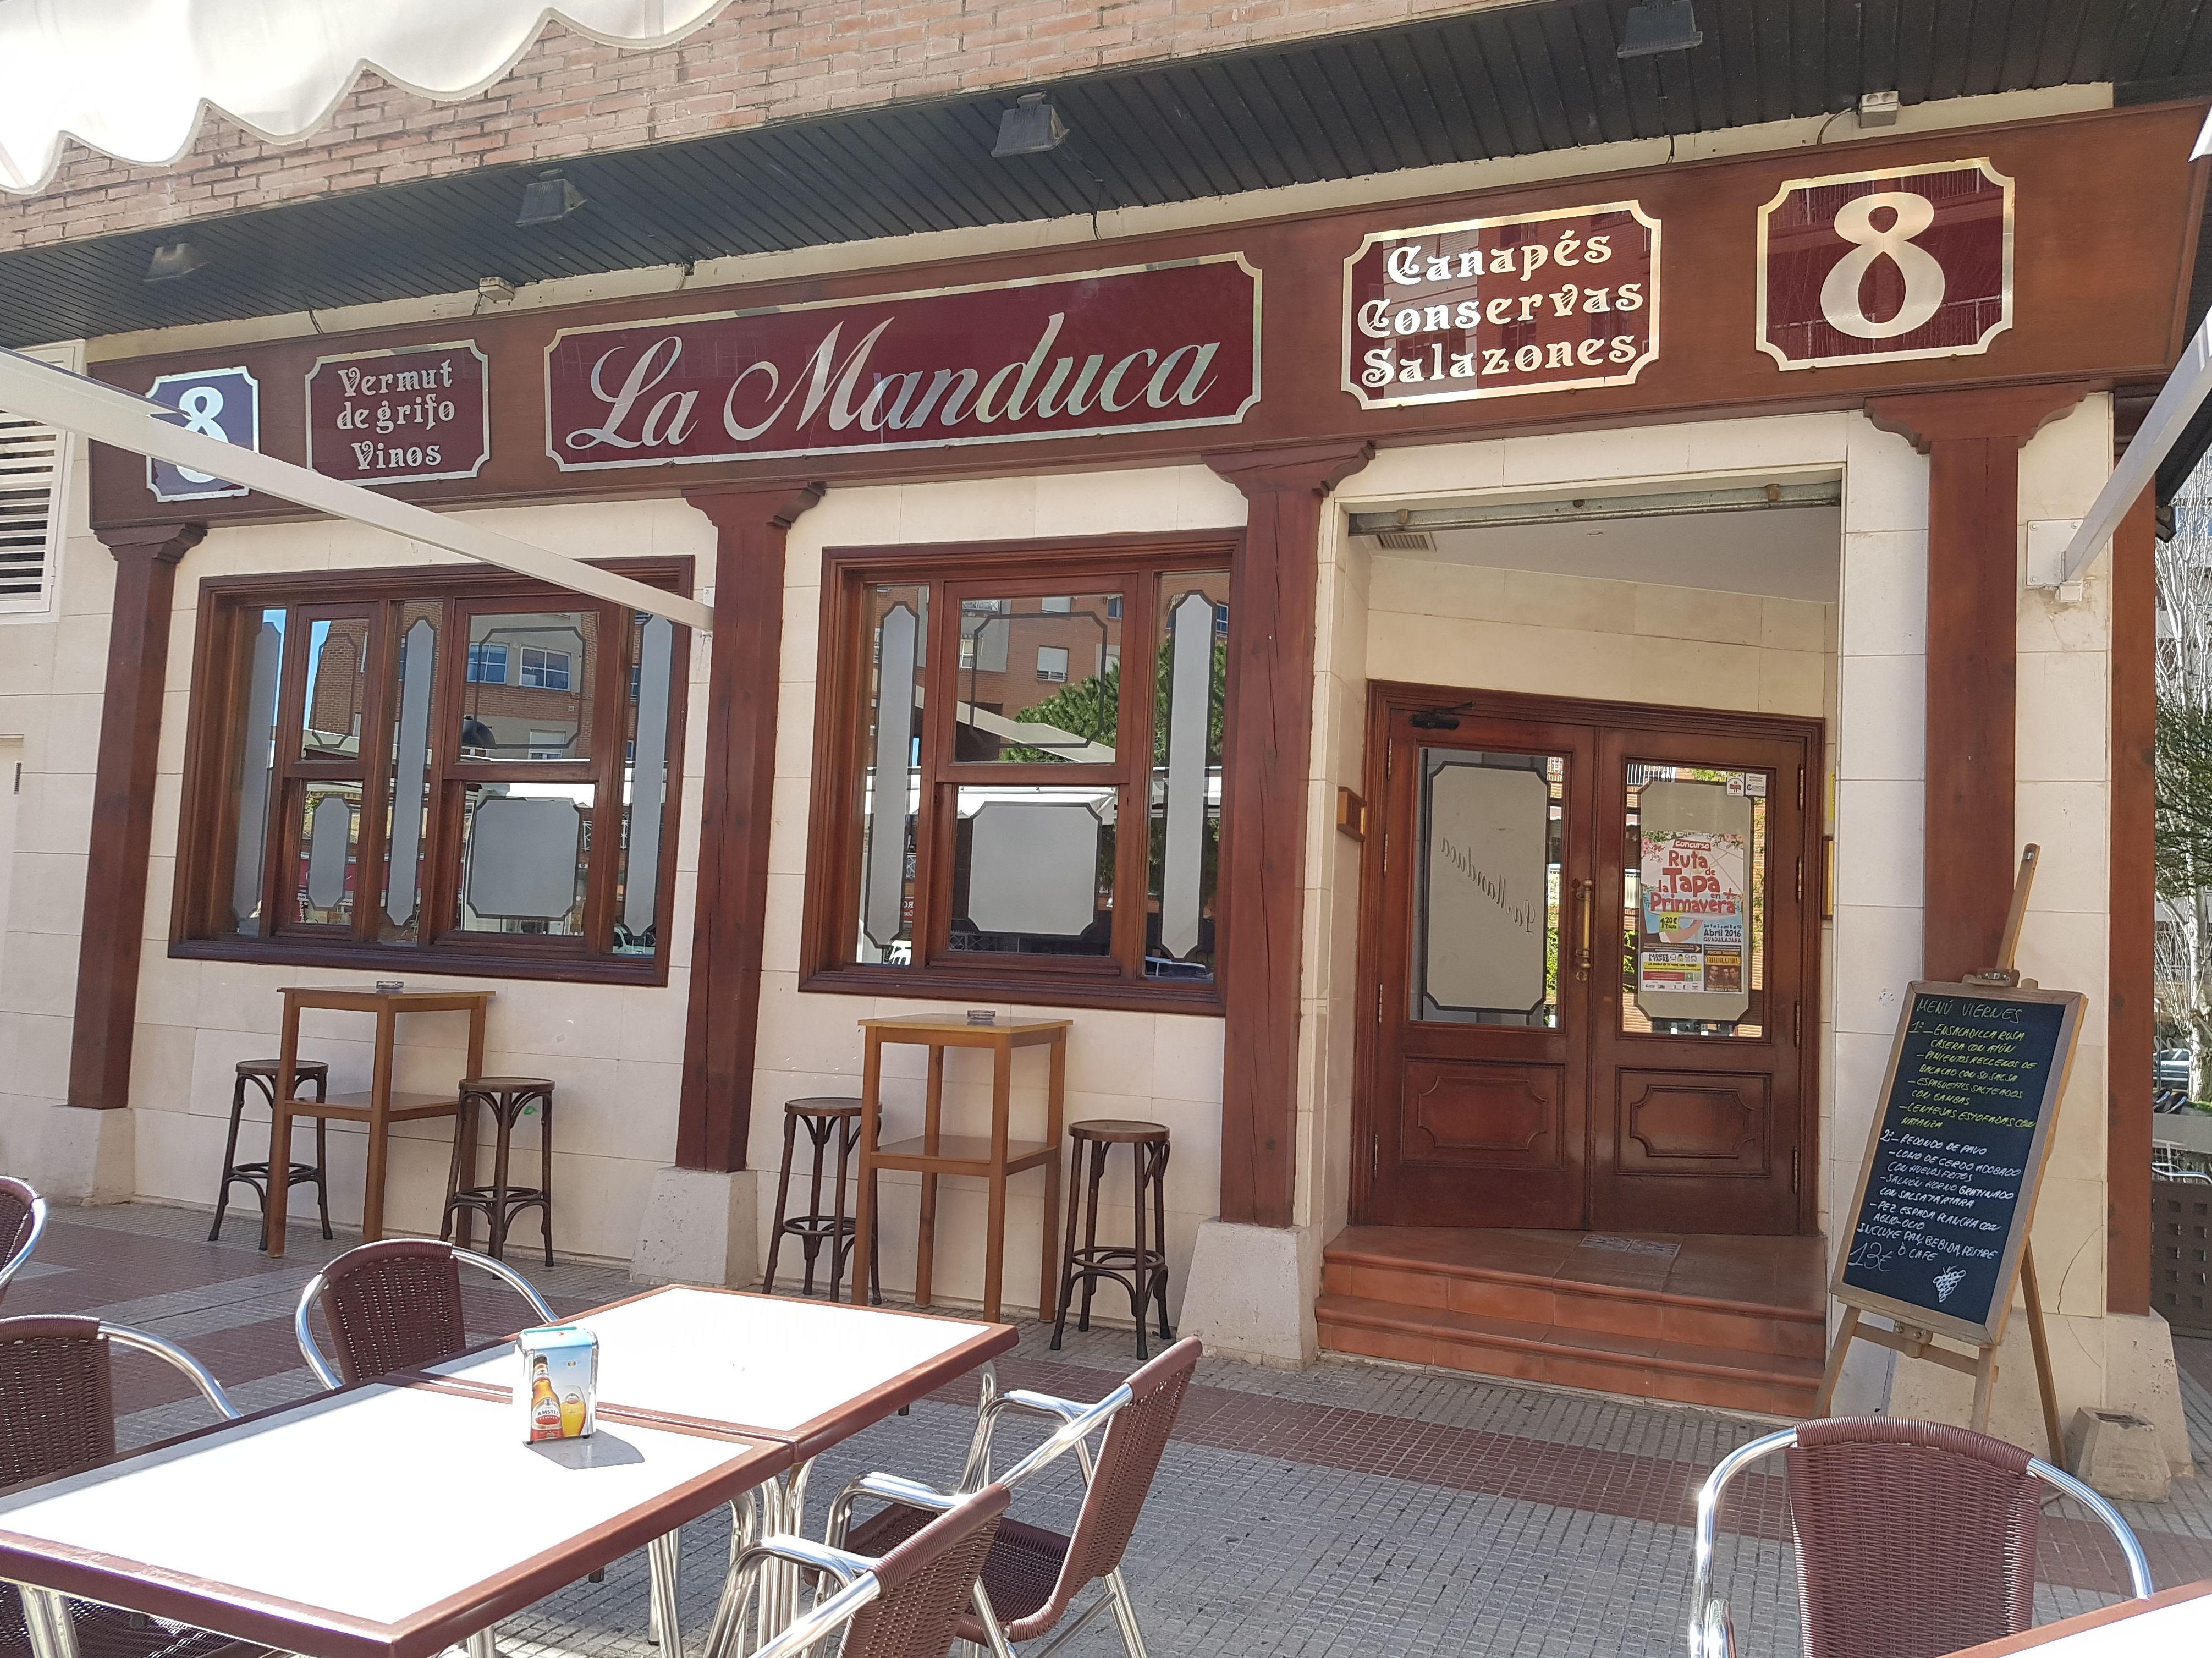 Fachada del restaurante La Manduca en Guadalajara